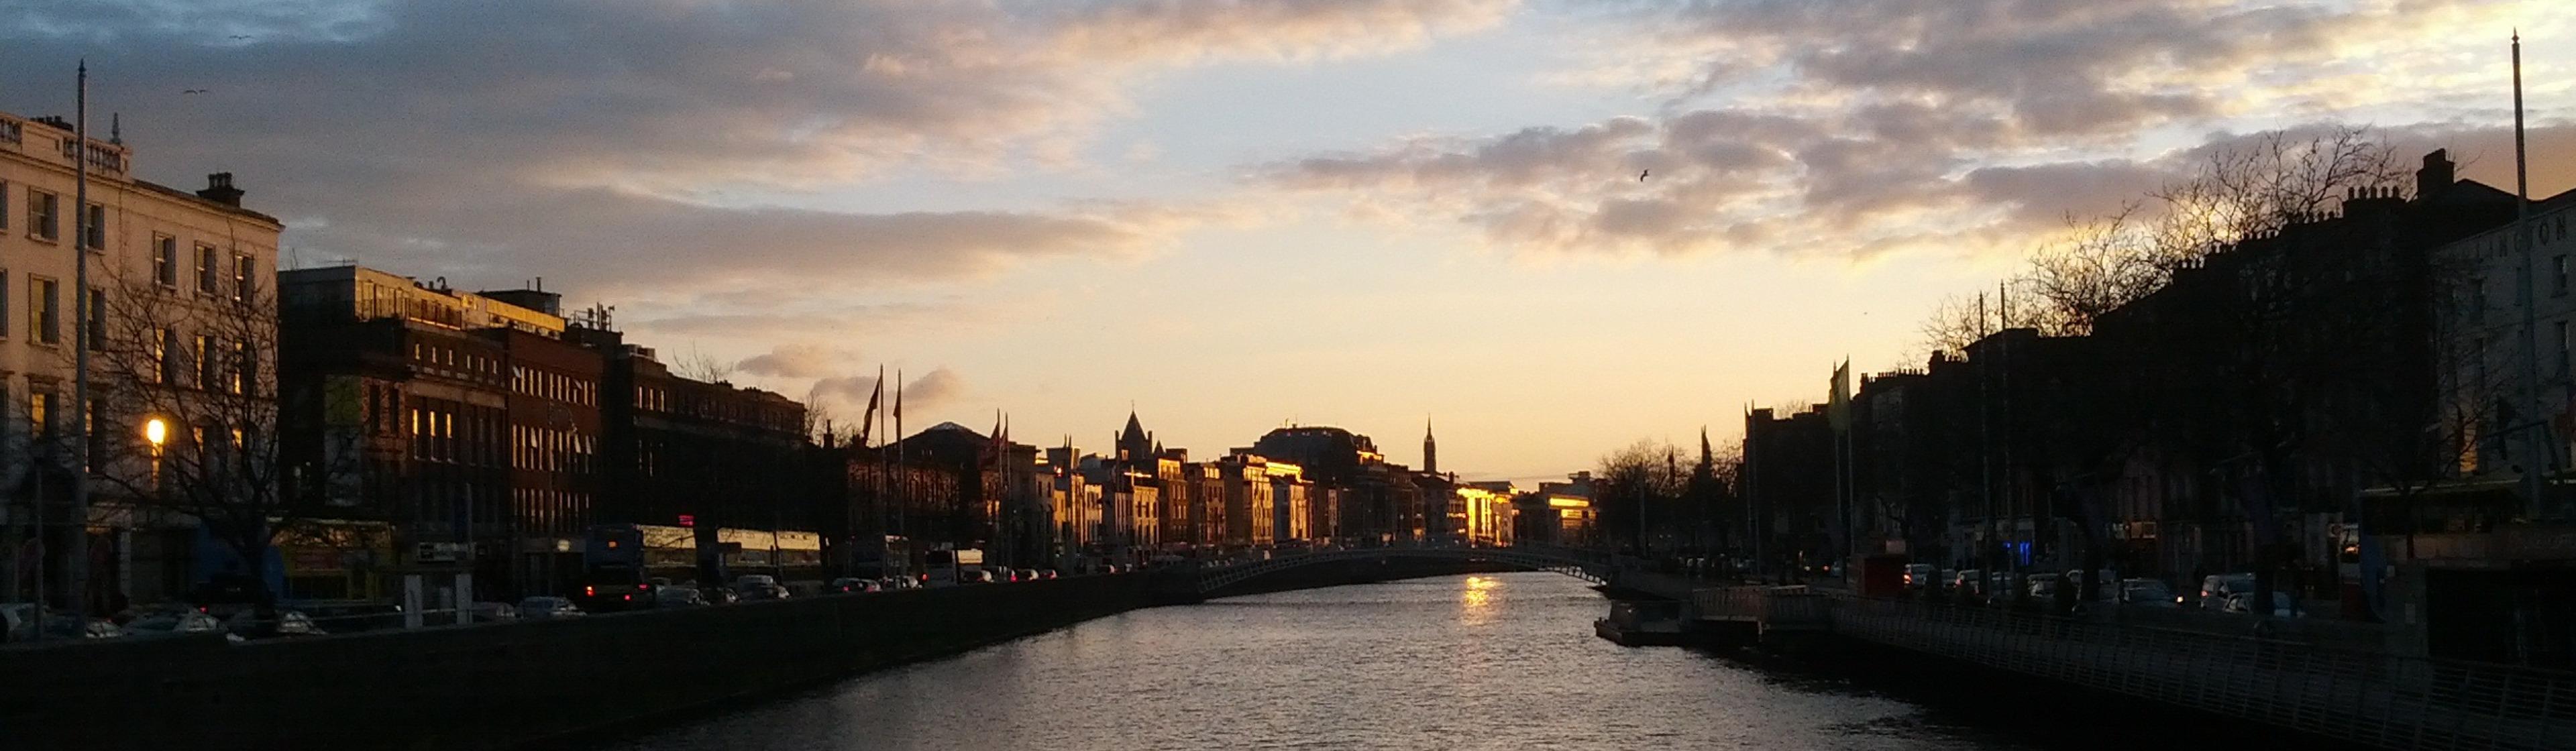 Travel Bucketlist: Dublin